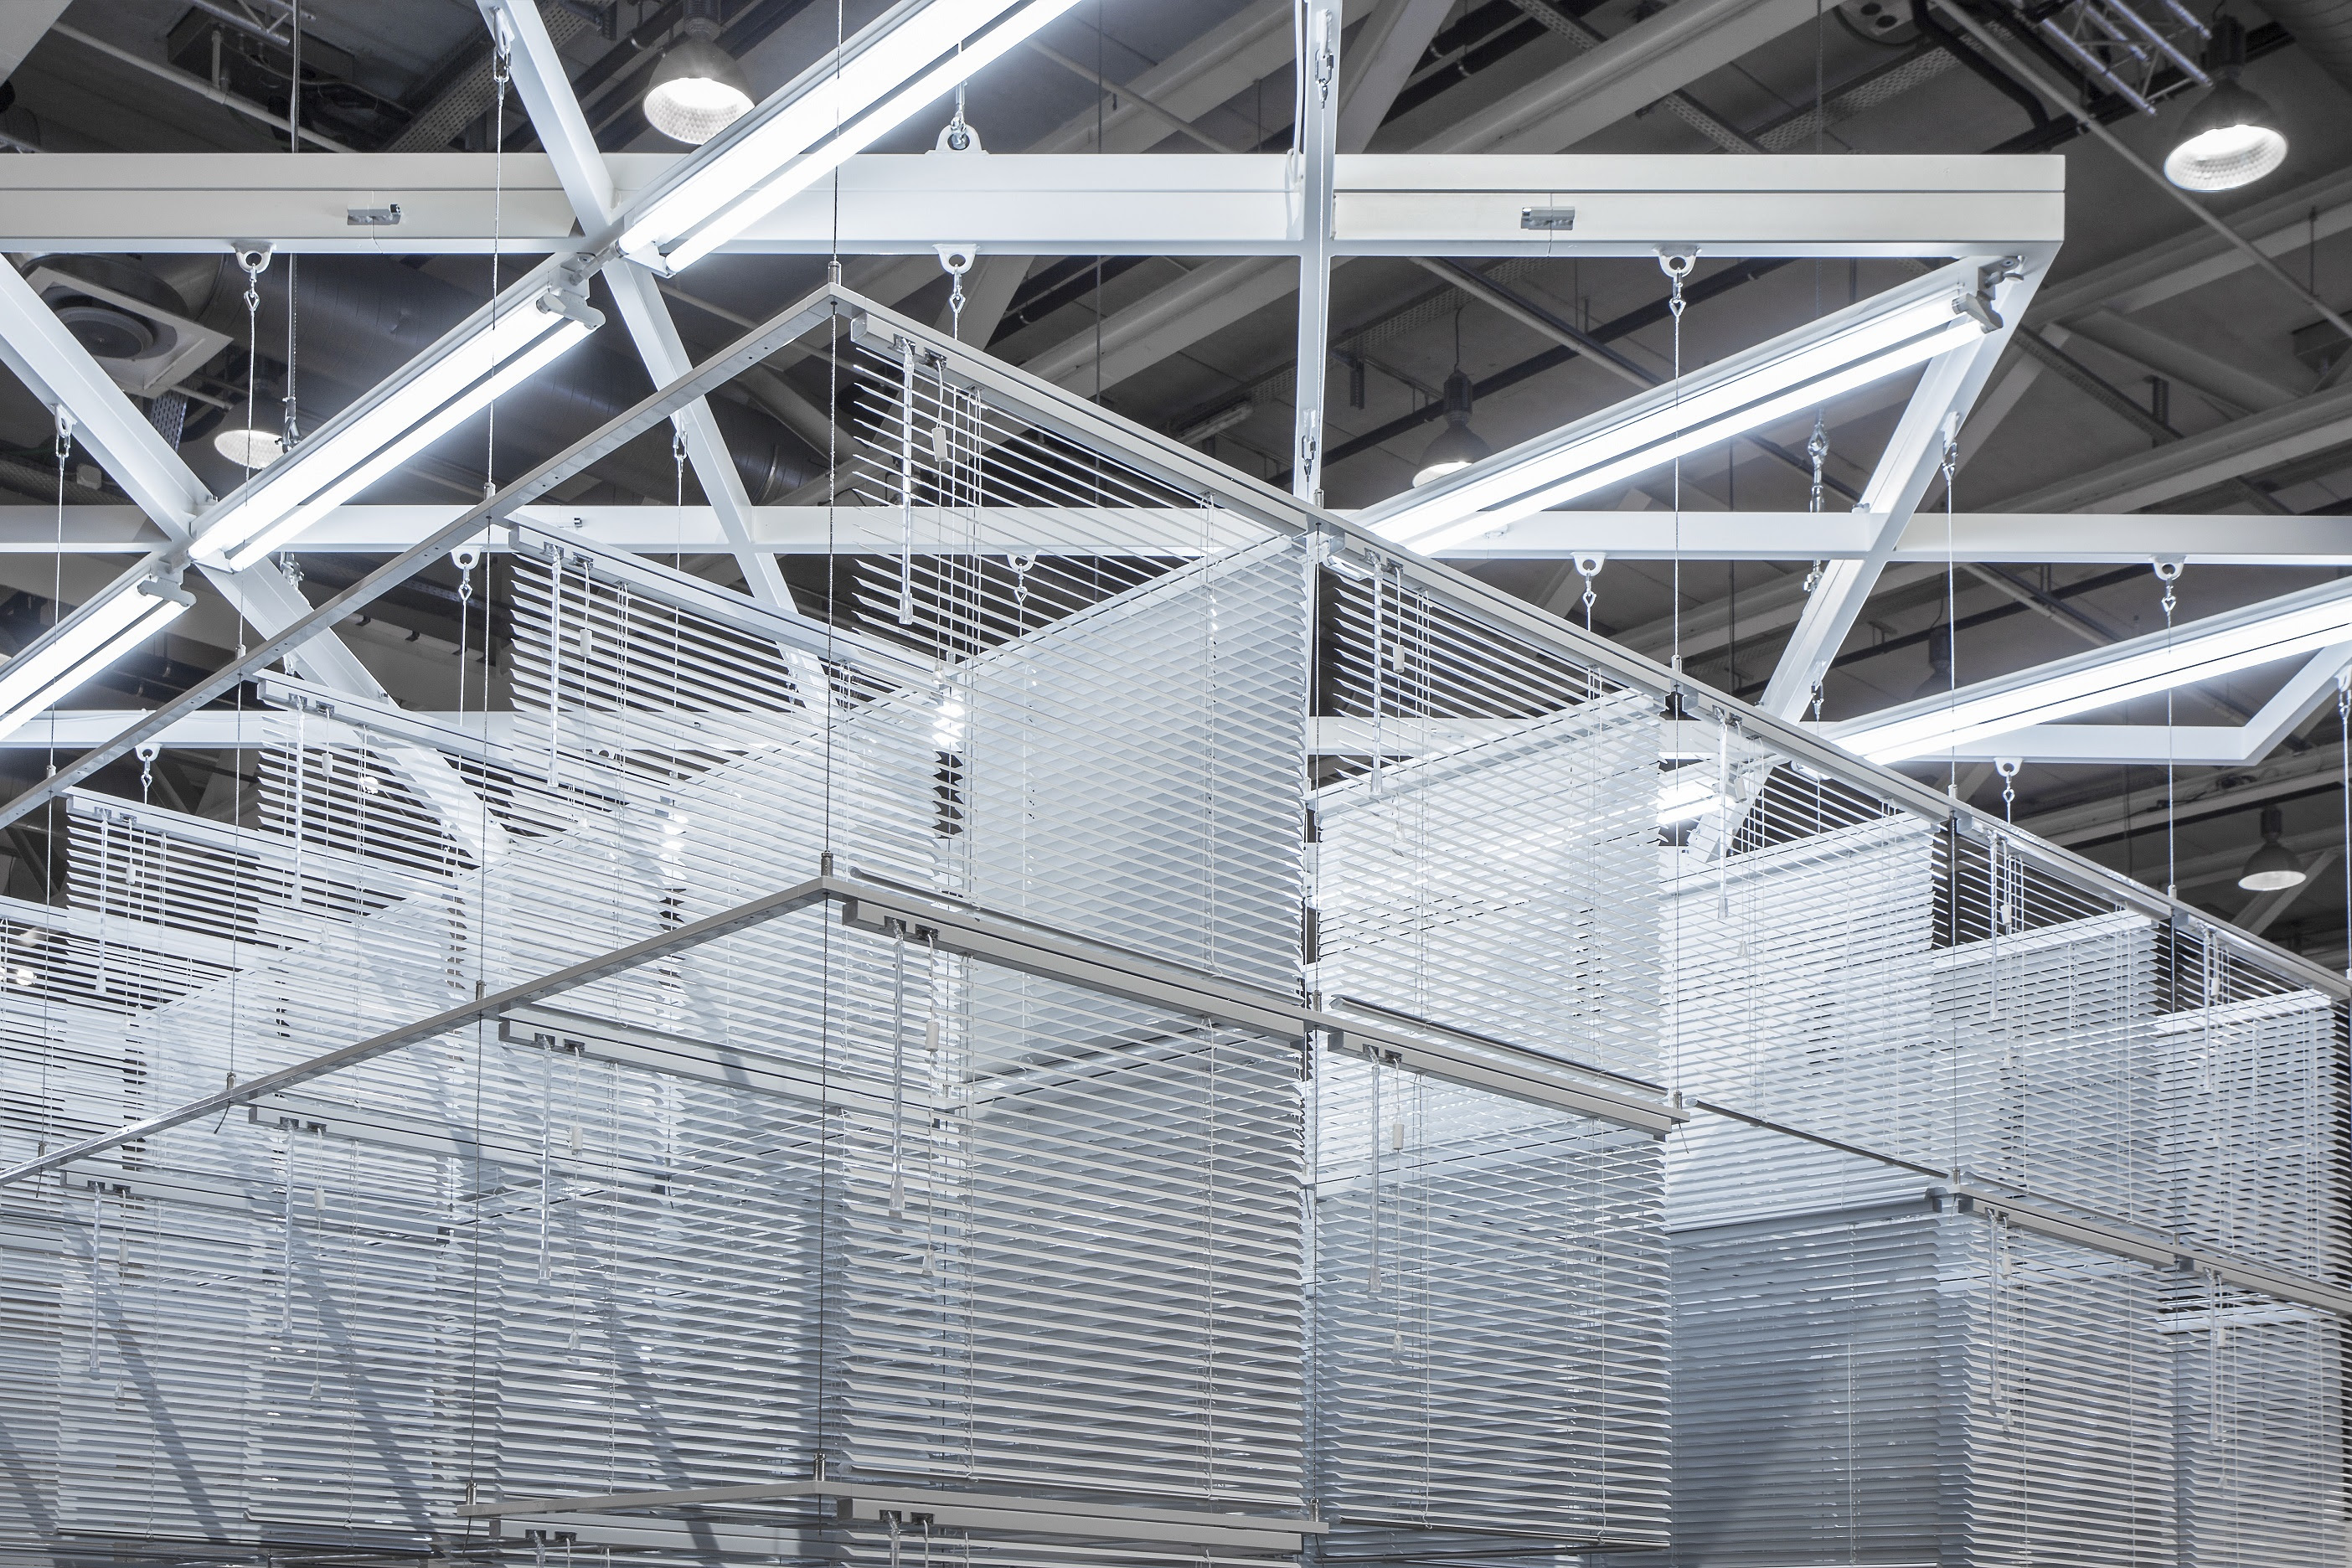 Tate Modern unveils major acquisition by South Korea's Haegue Yang